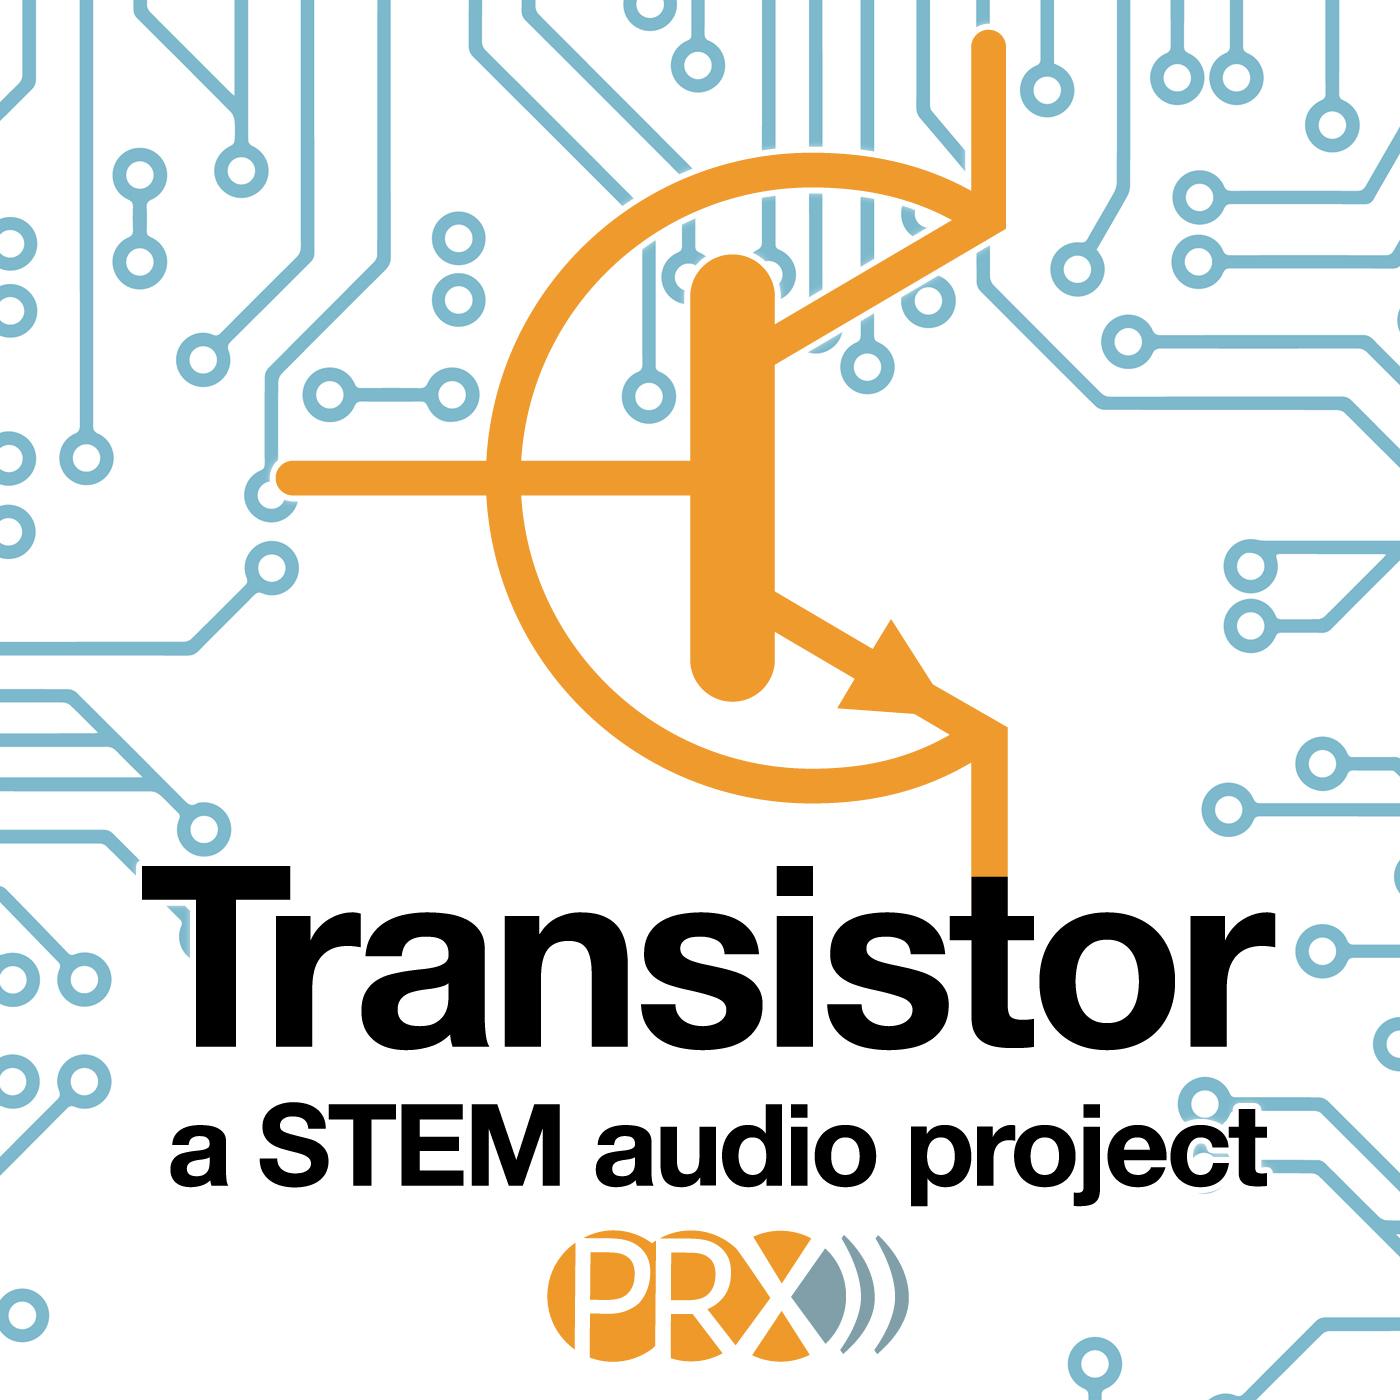 Transistor1400x1400_small